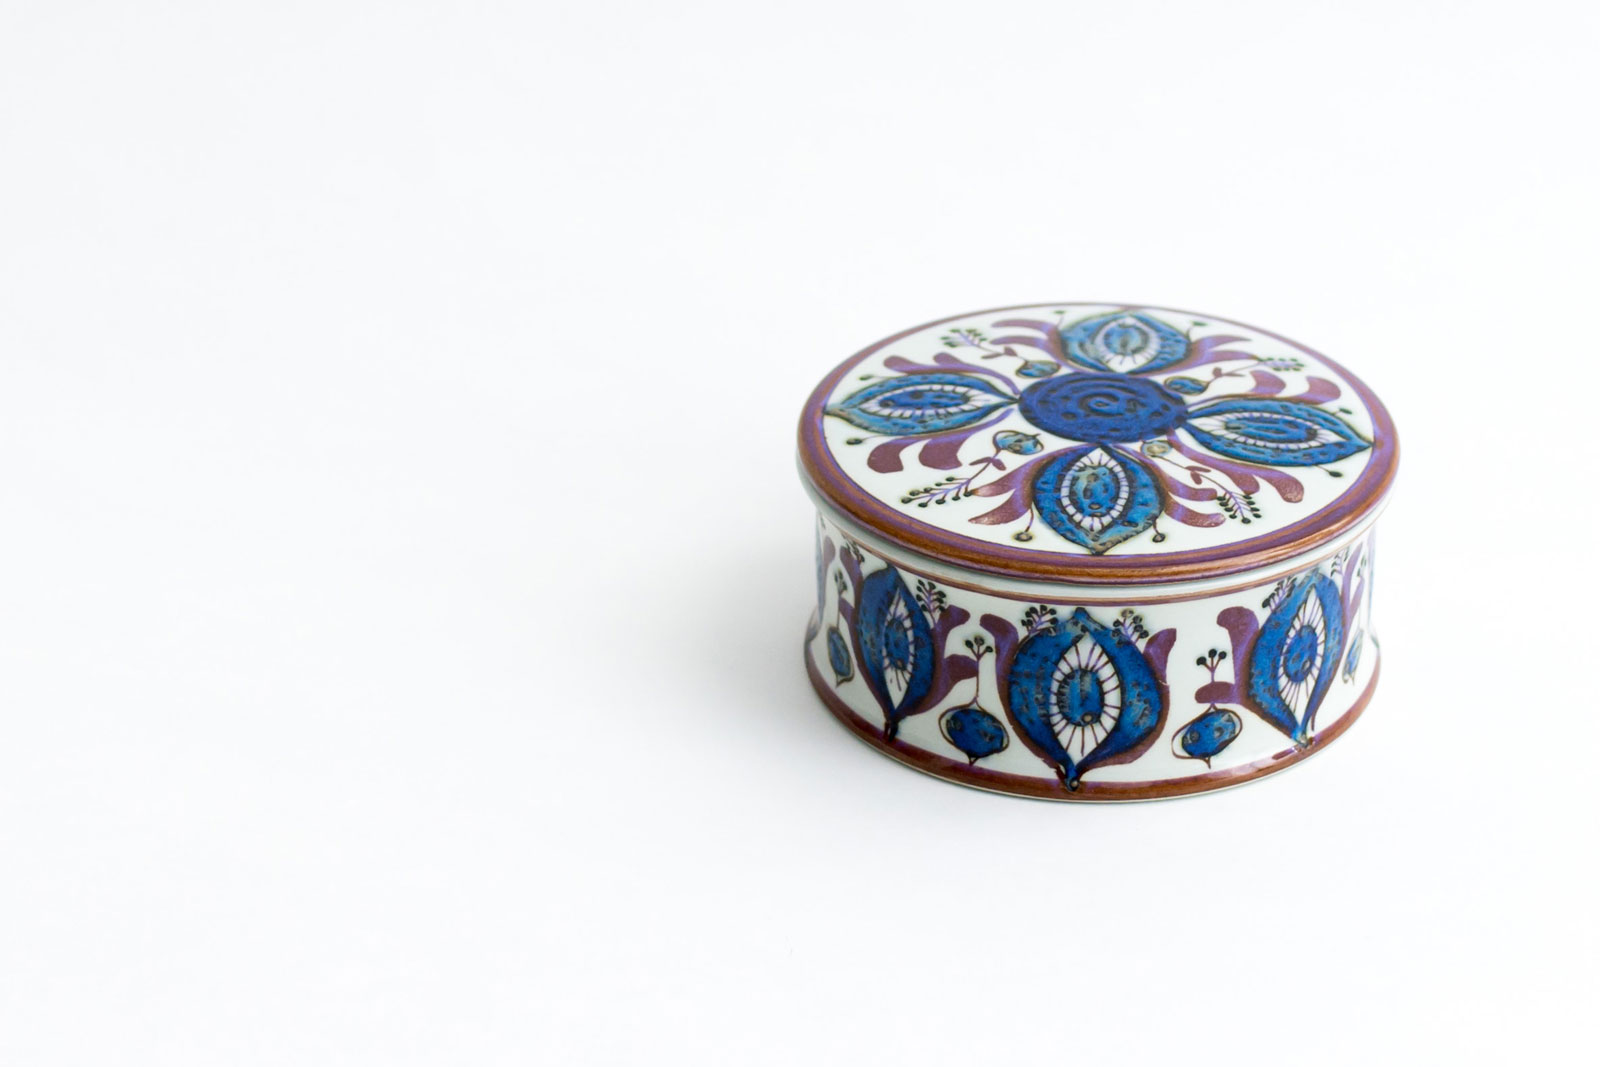 Trinket box designed by Berte Jessen